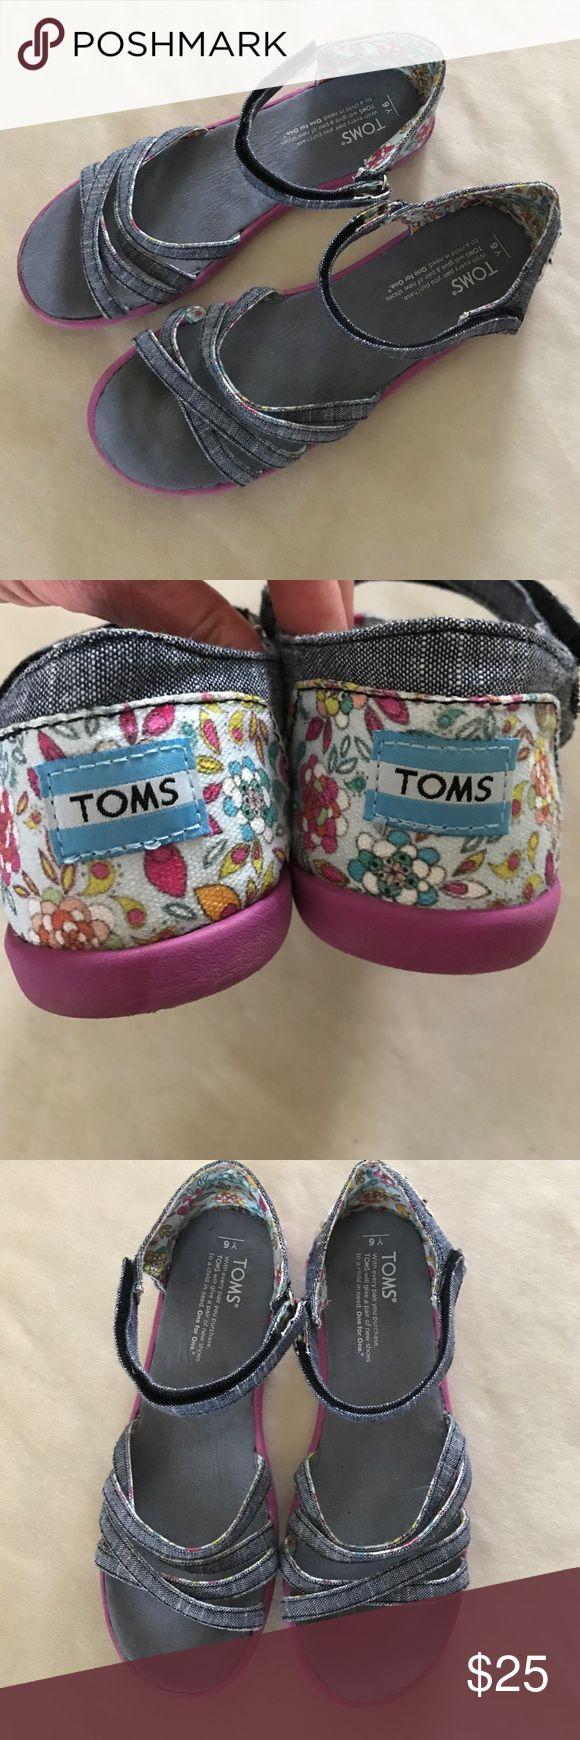 TOMs denim sandals Y6 Youth 6, gently used.  Bundle for a discount! TOMS Shoes Sandals & Flip Flops